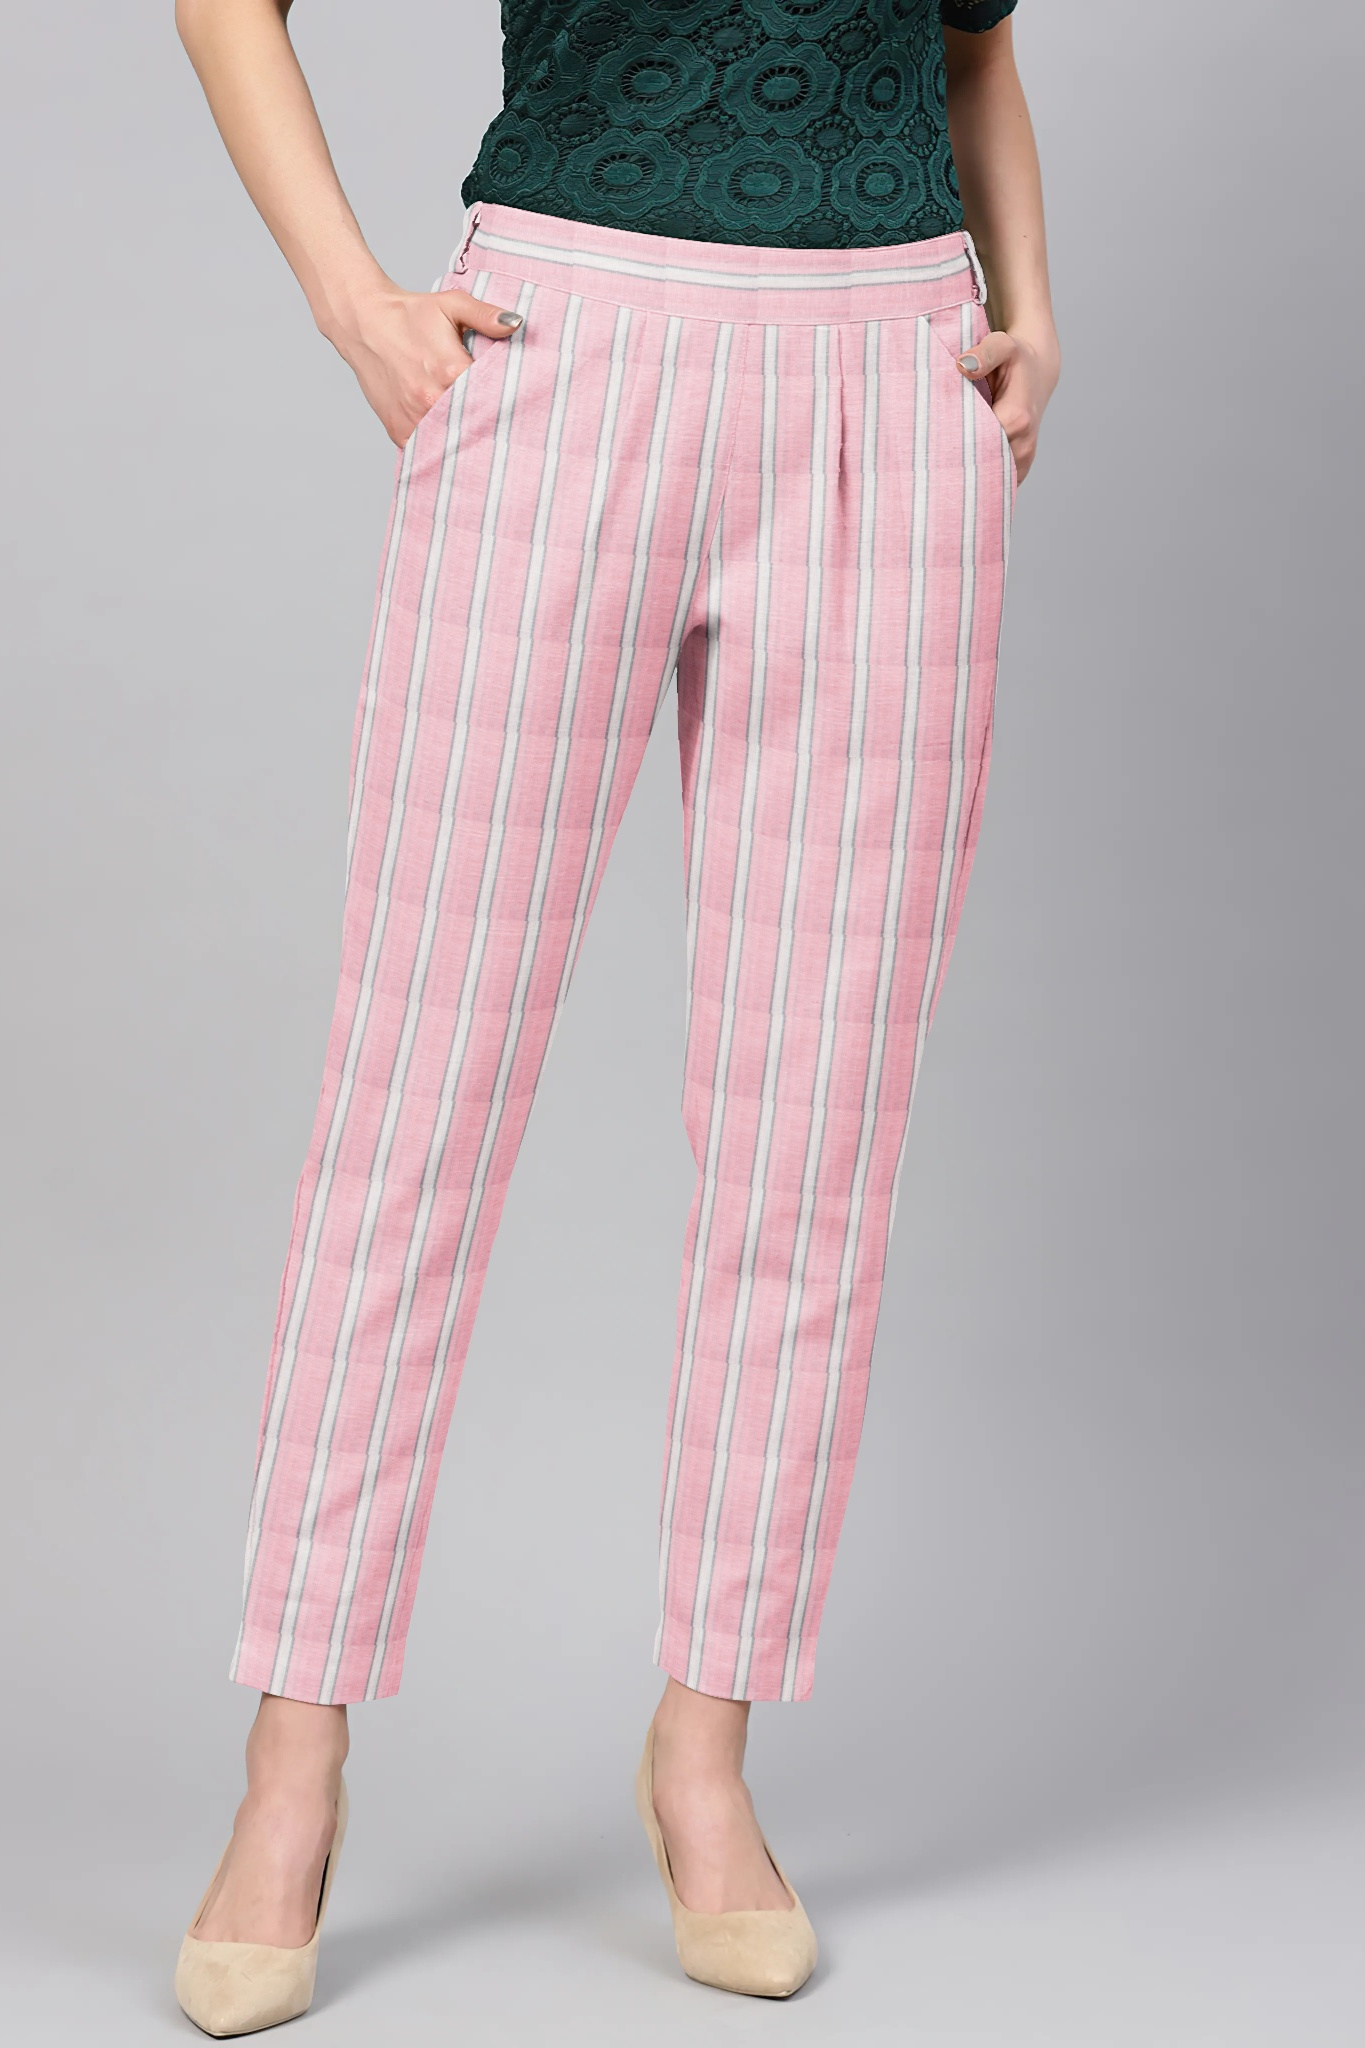 /home/customer/www/fabartcraft.com/public_html/uploadshttps://www.shopolics.com/uploads/images/medium/Pink-White-Cotton-Stripe-Regular-Fit-Solid-Trouser-36062.jpg